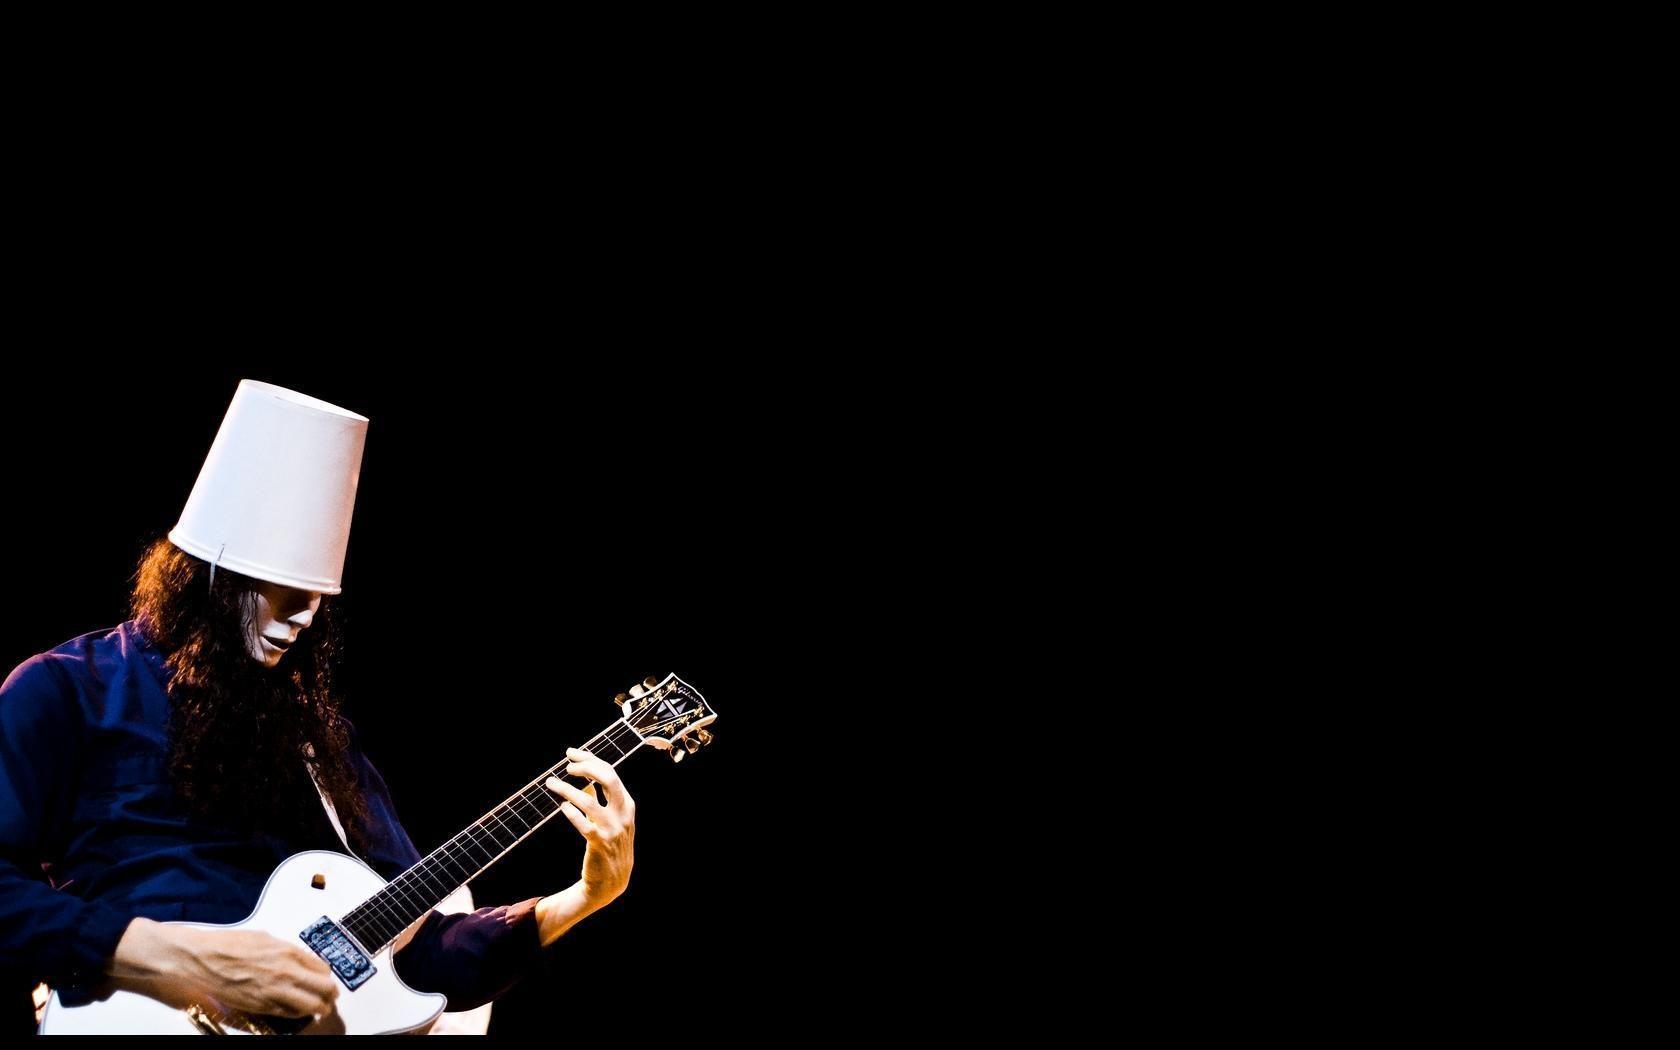 Buckethead Guitar Music Wallpapers Hd Wallpaper Cave